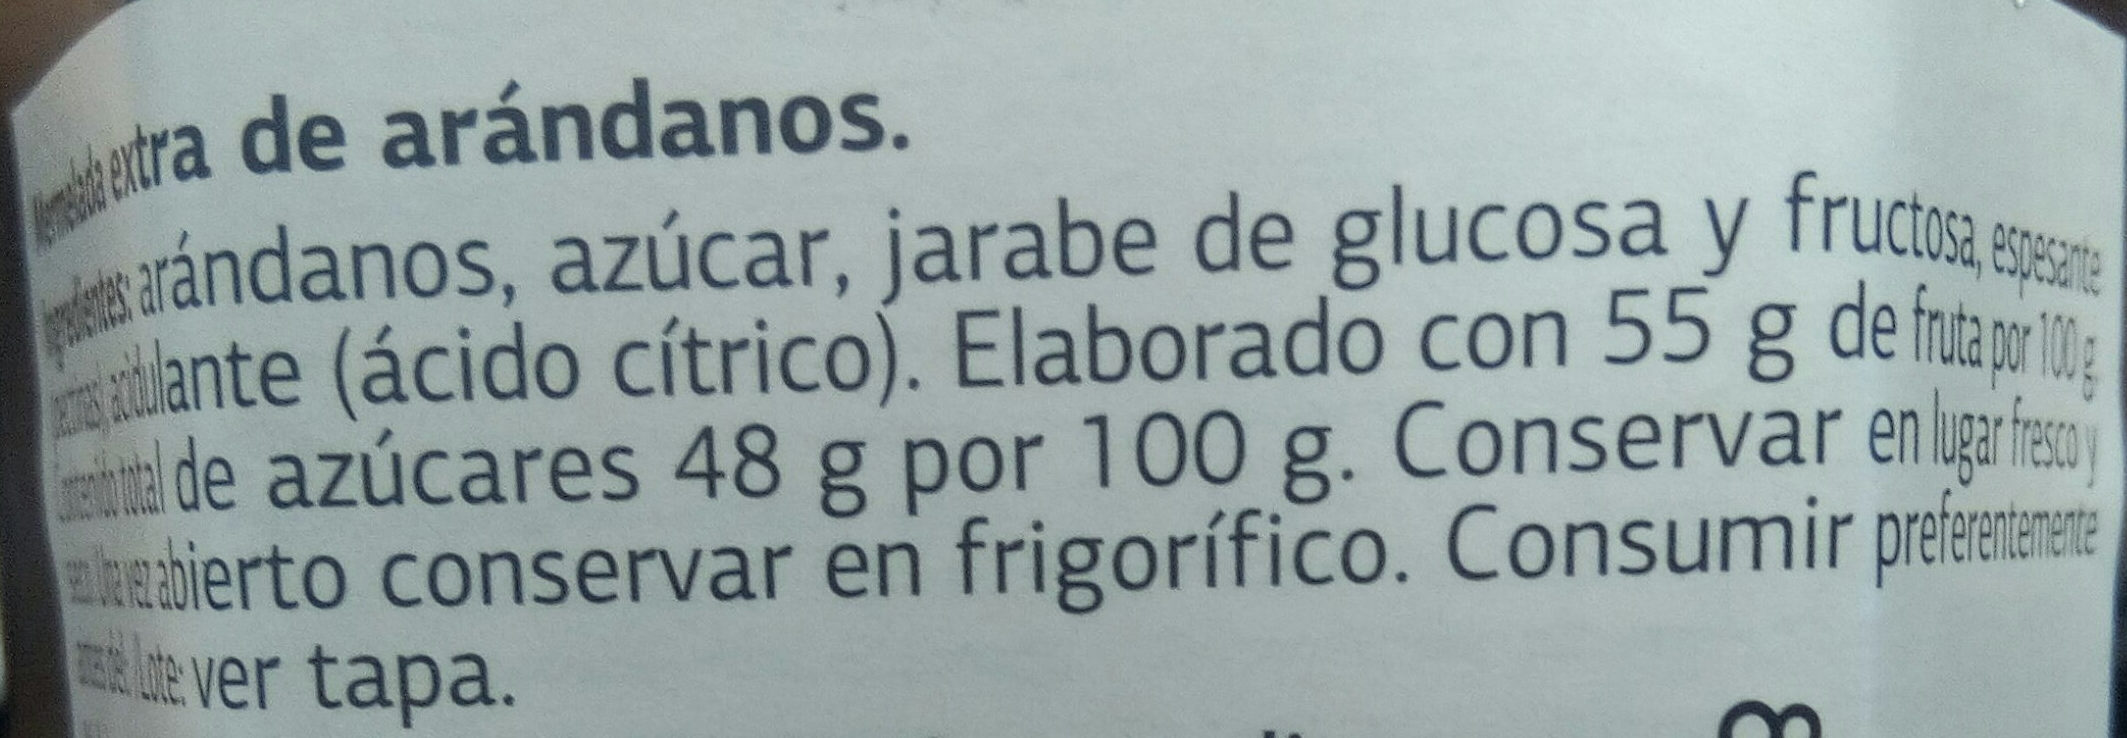 Mermelada de arandanos - Ingredients - es